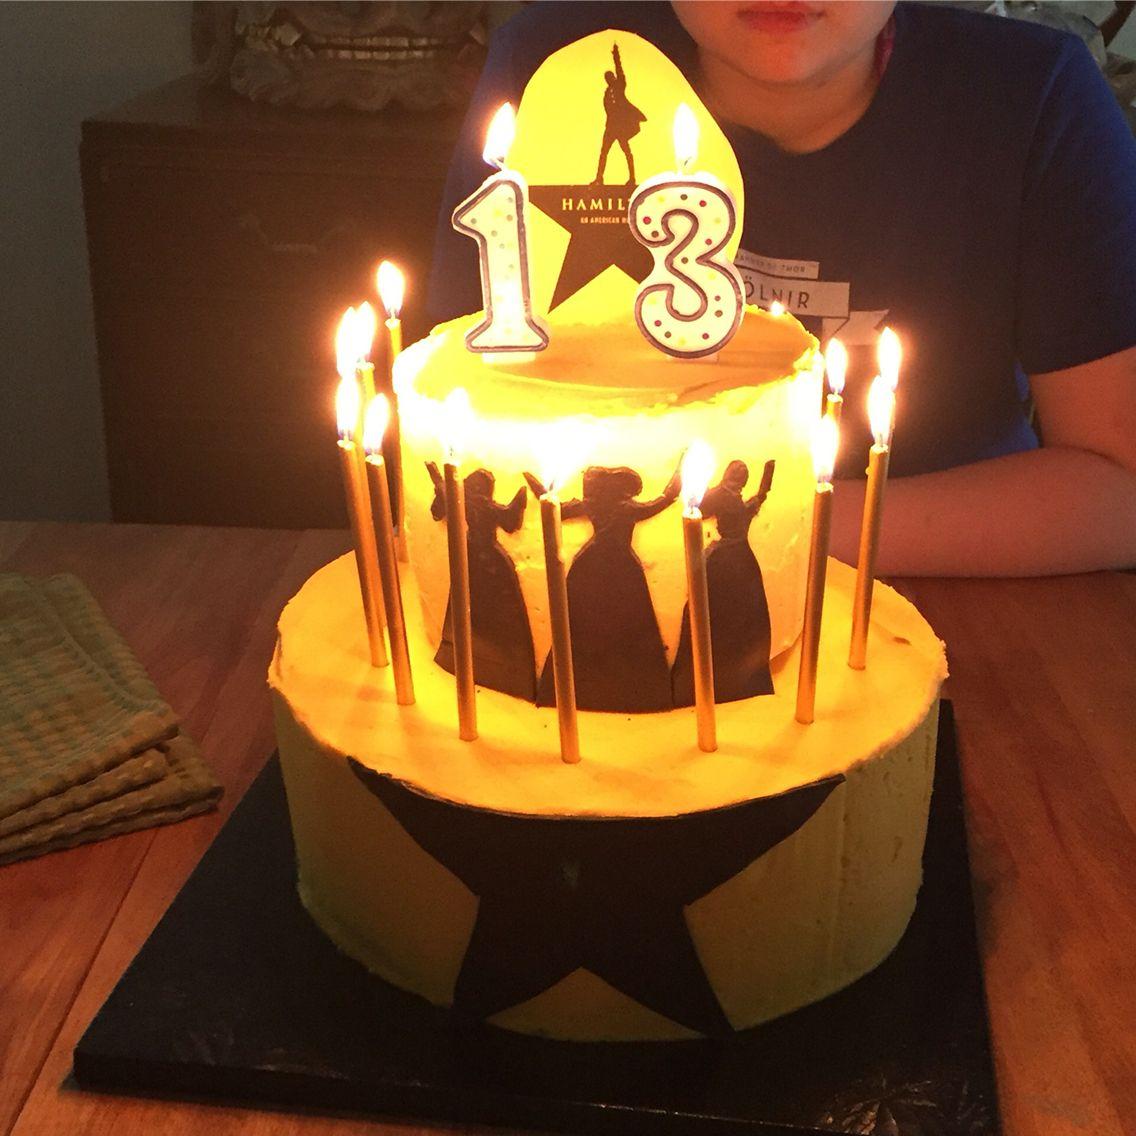 Hamilton Birthday Cake With Fondant Silhouettes